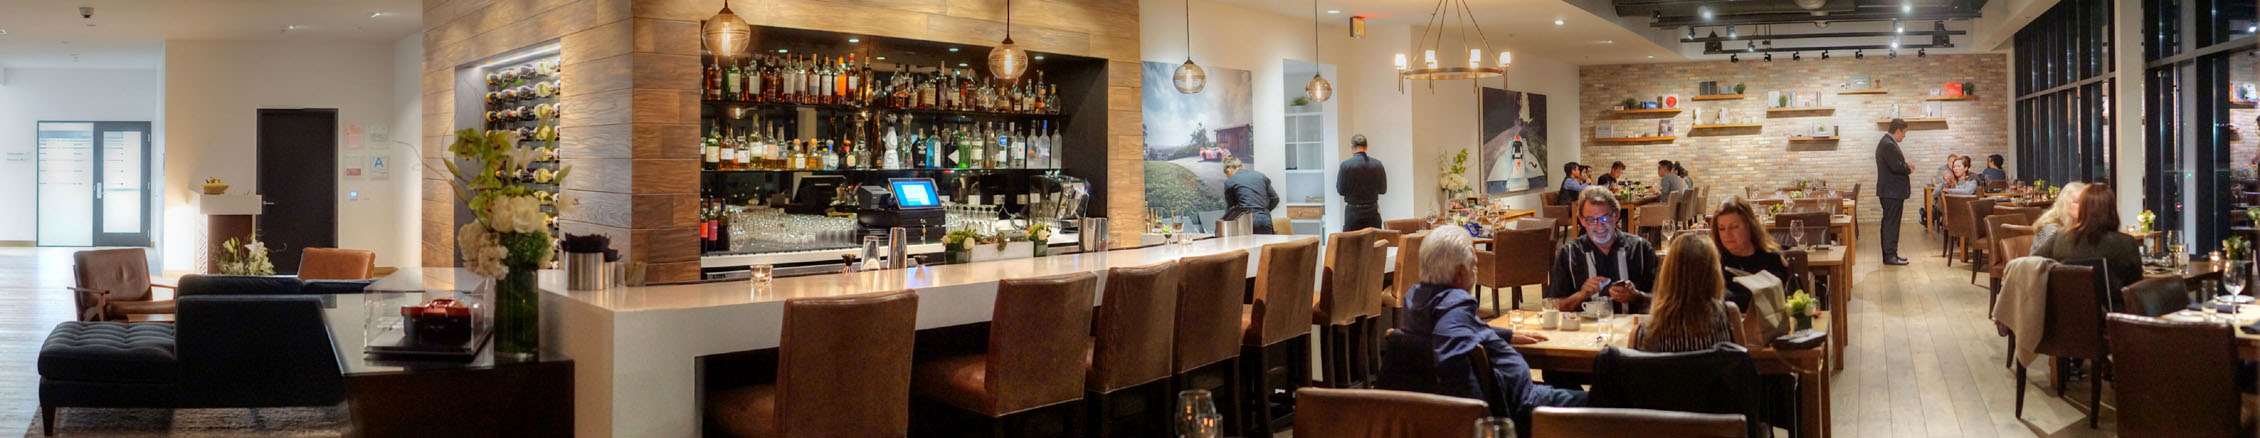 Restaurant 917 Interior